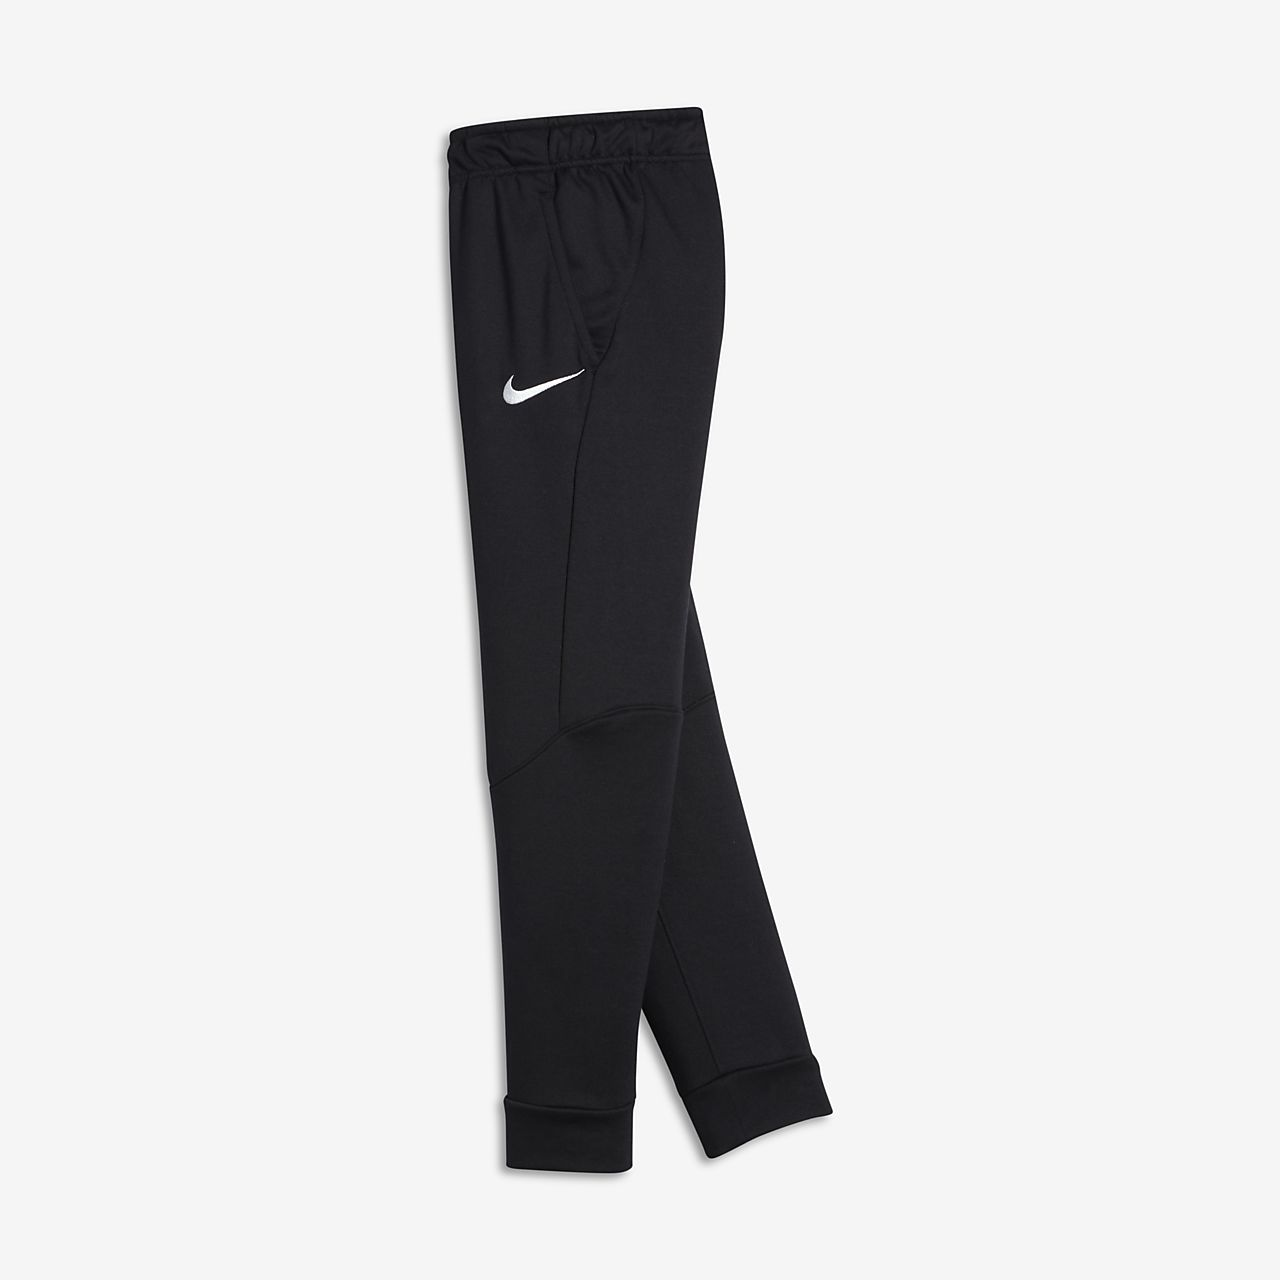 Nike Dri-FIT Fleece Training Pants Boys Black/Black